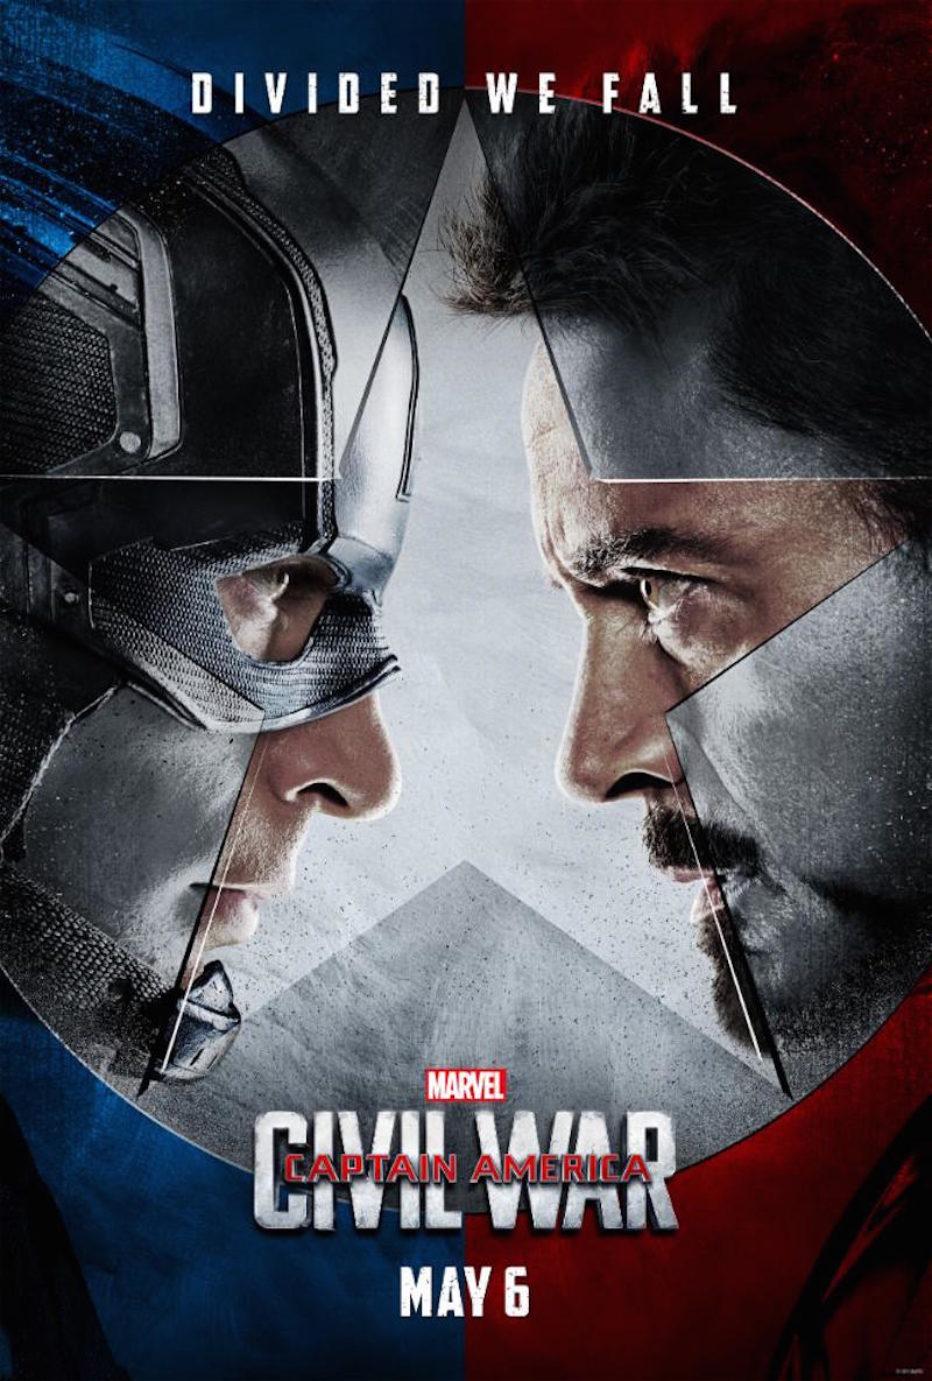 Primer trailer y posters de Capitán América: Civil War